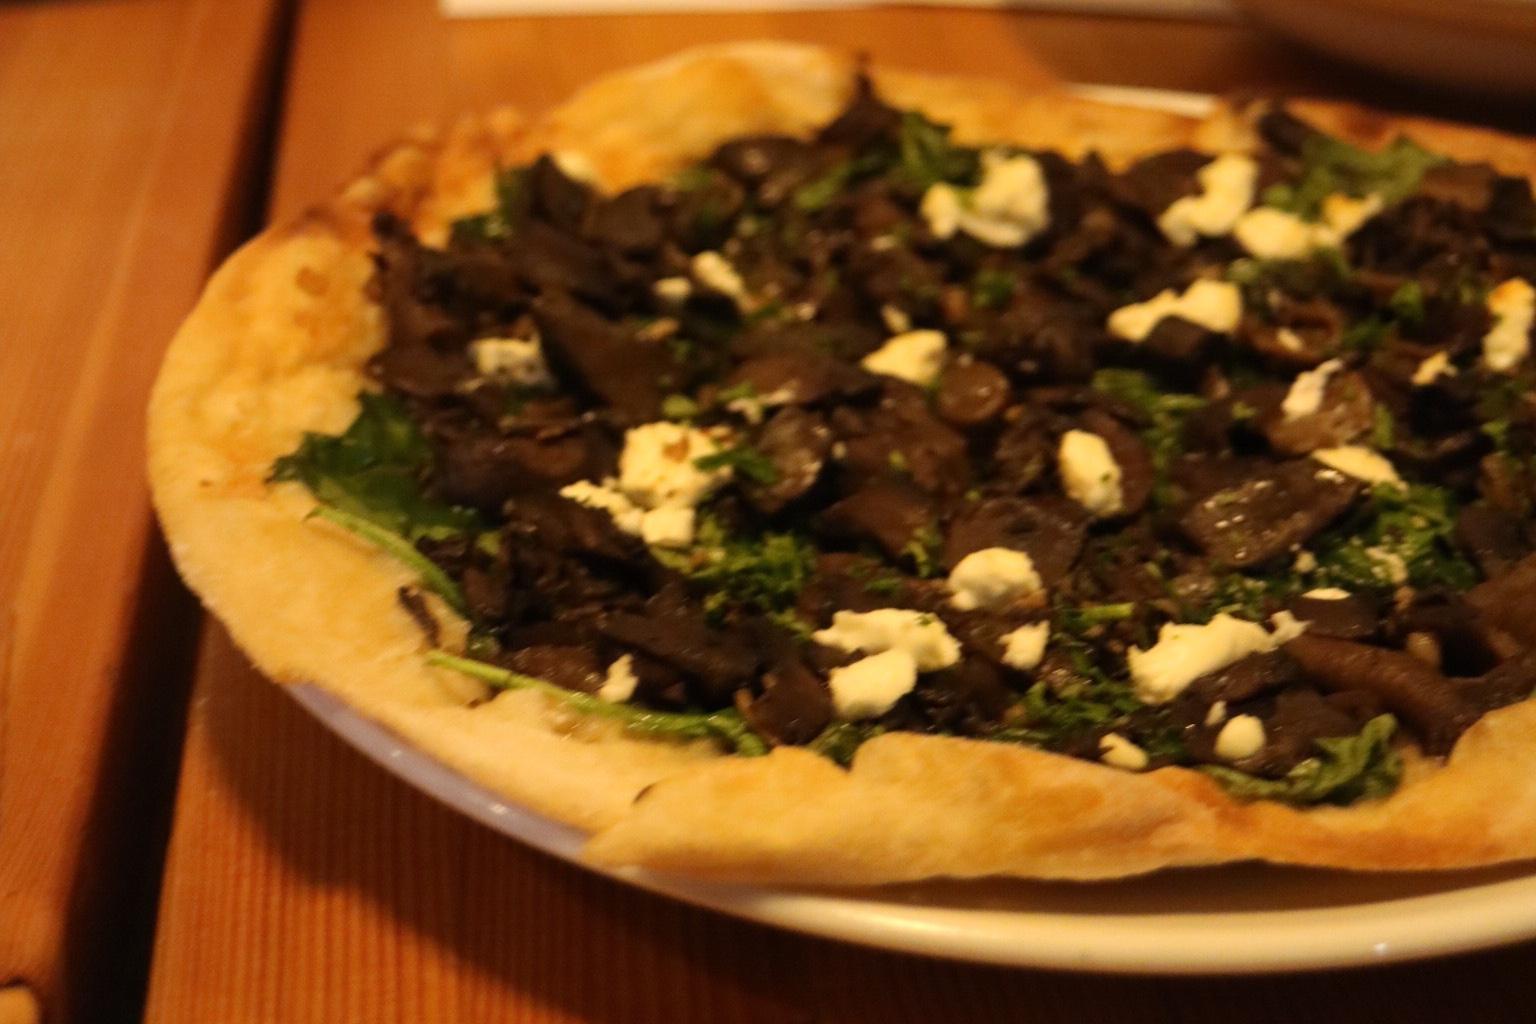 Vegan Wild Mushroom Pizza